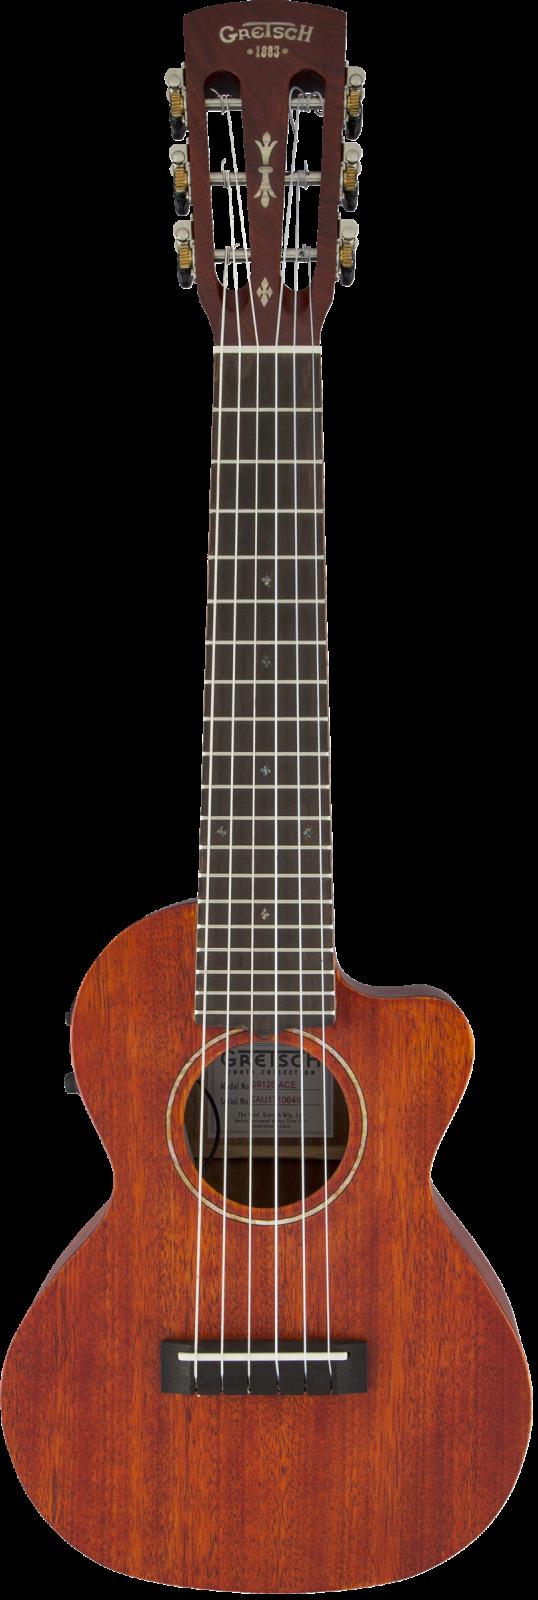 Gretsch G9126 A.C.E. 6 String Guitar-Ukulele Acoustic-electric with Gig Bag